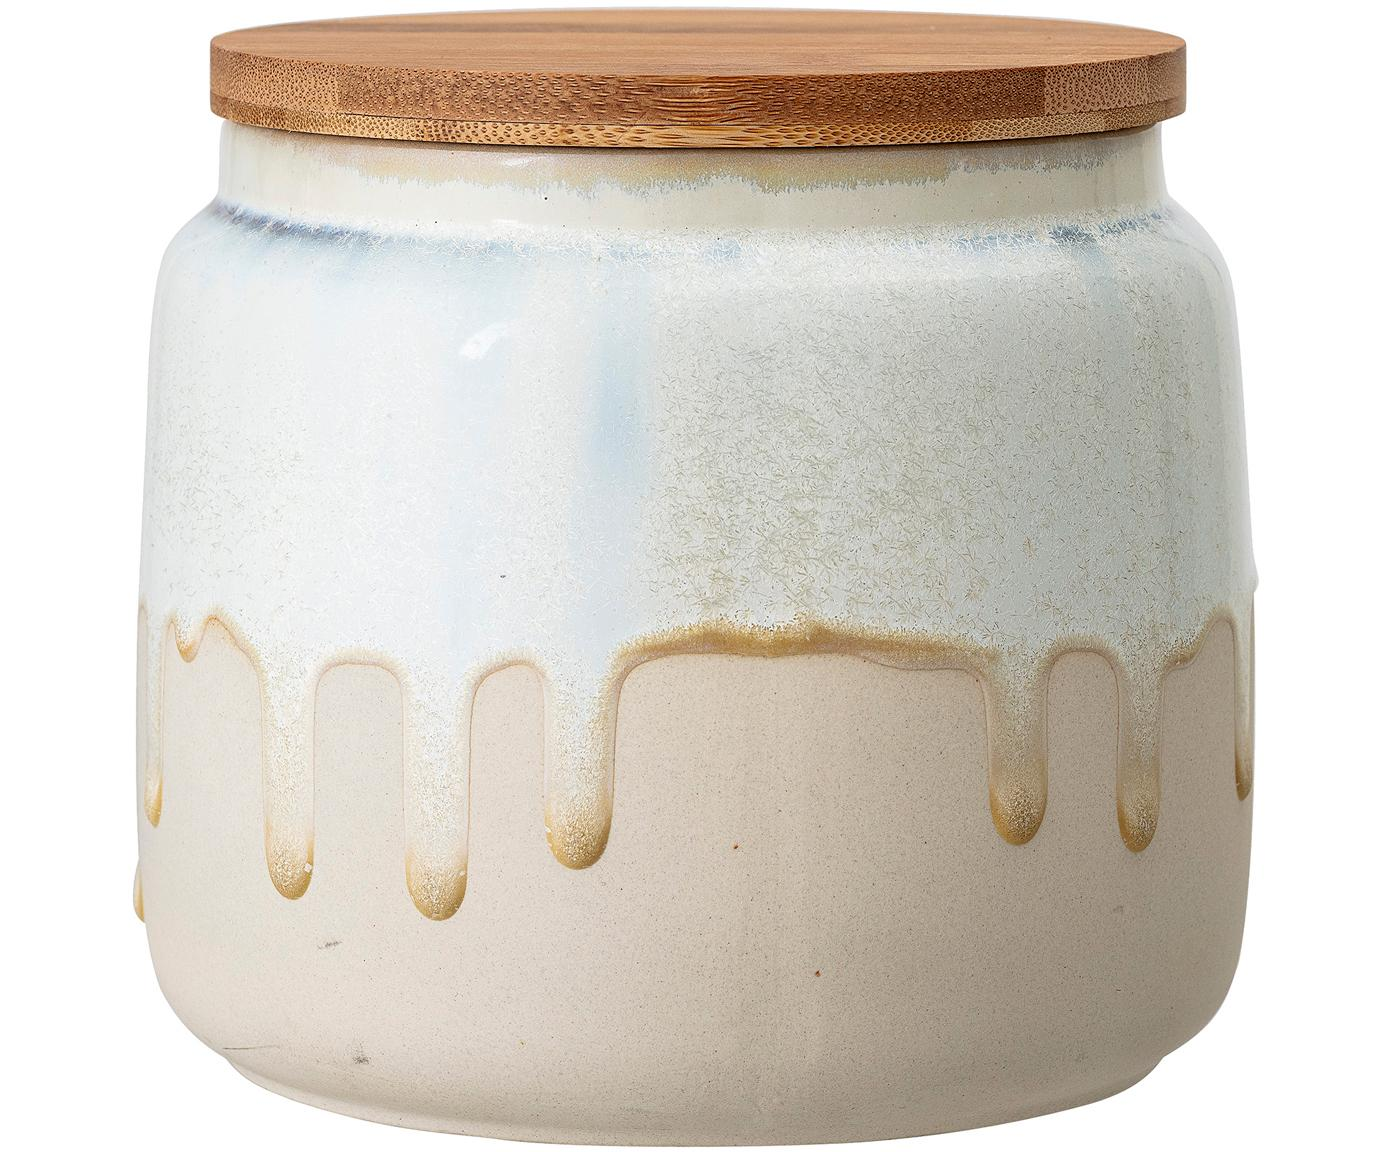 Handgemaakte opbergpot Terrain, Deksel: bamboehout, Gebroken wit, beige, bamboehout, Ø 16 x H 14 cm